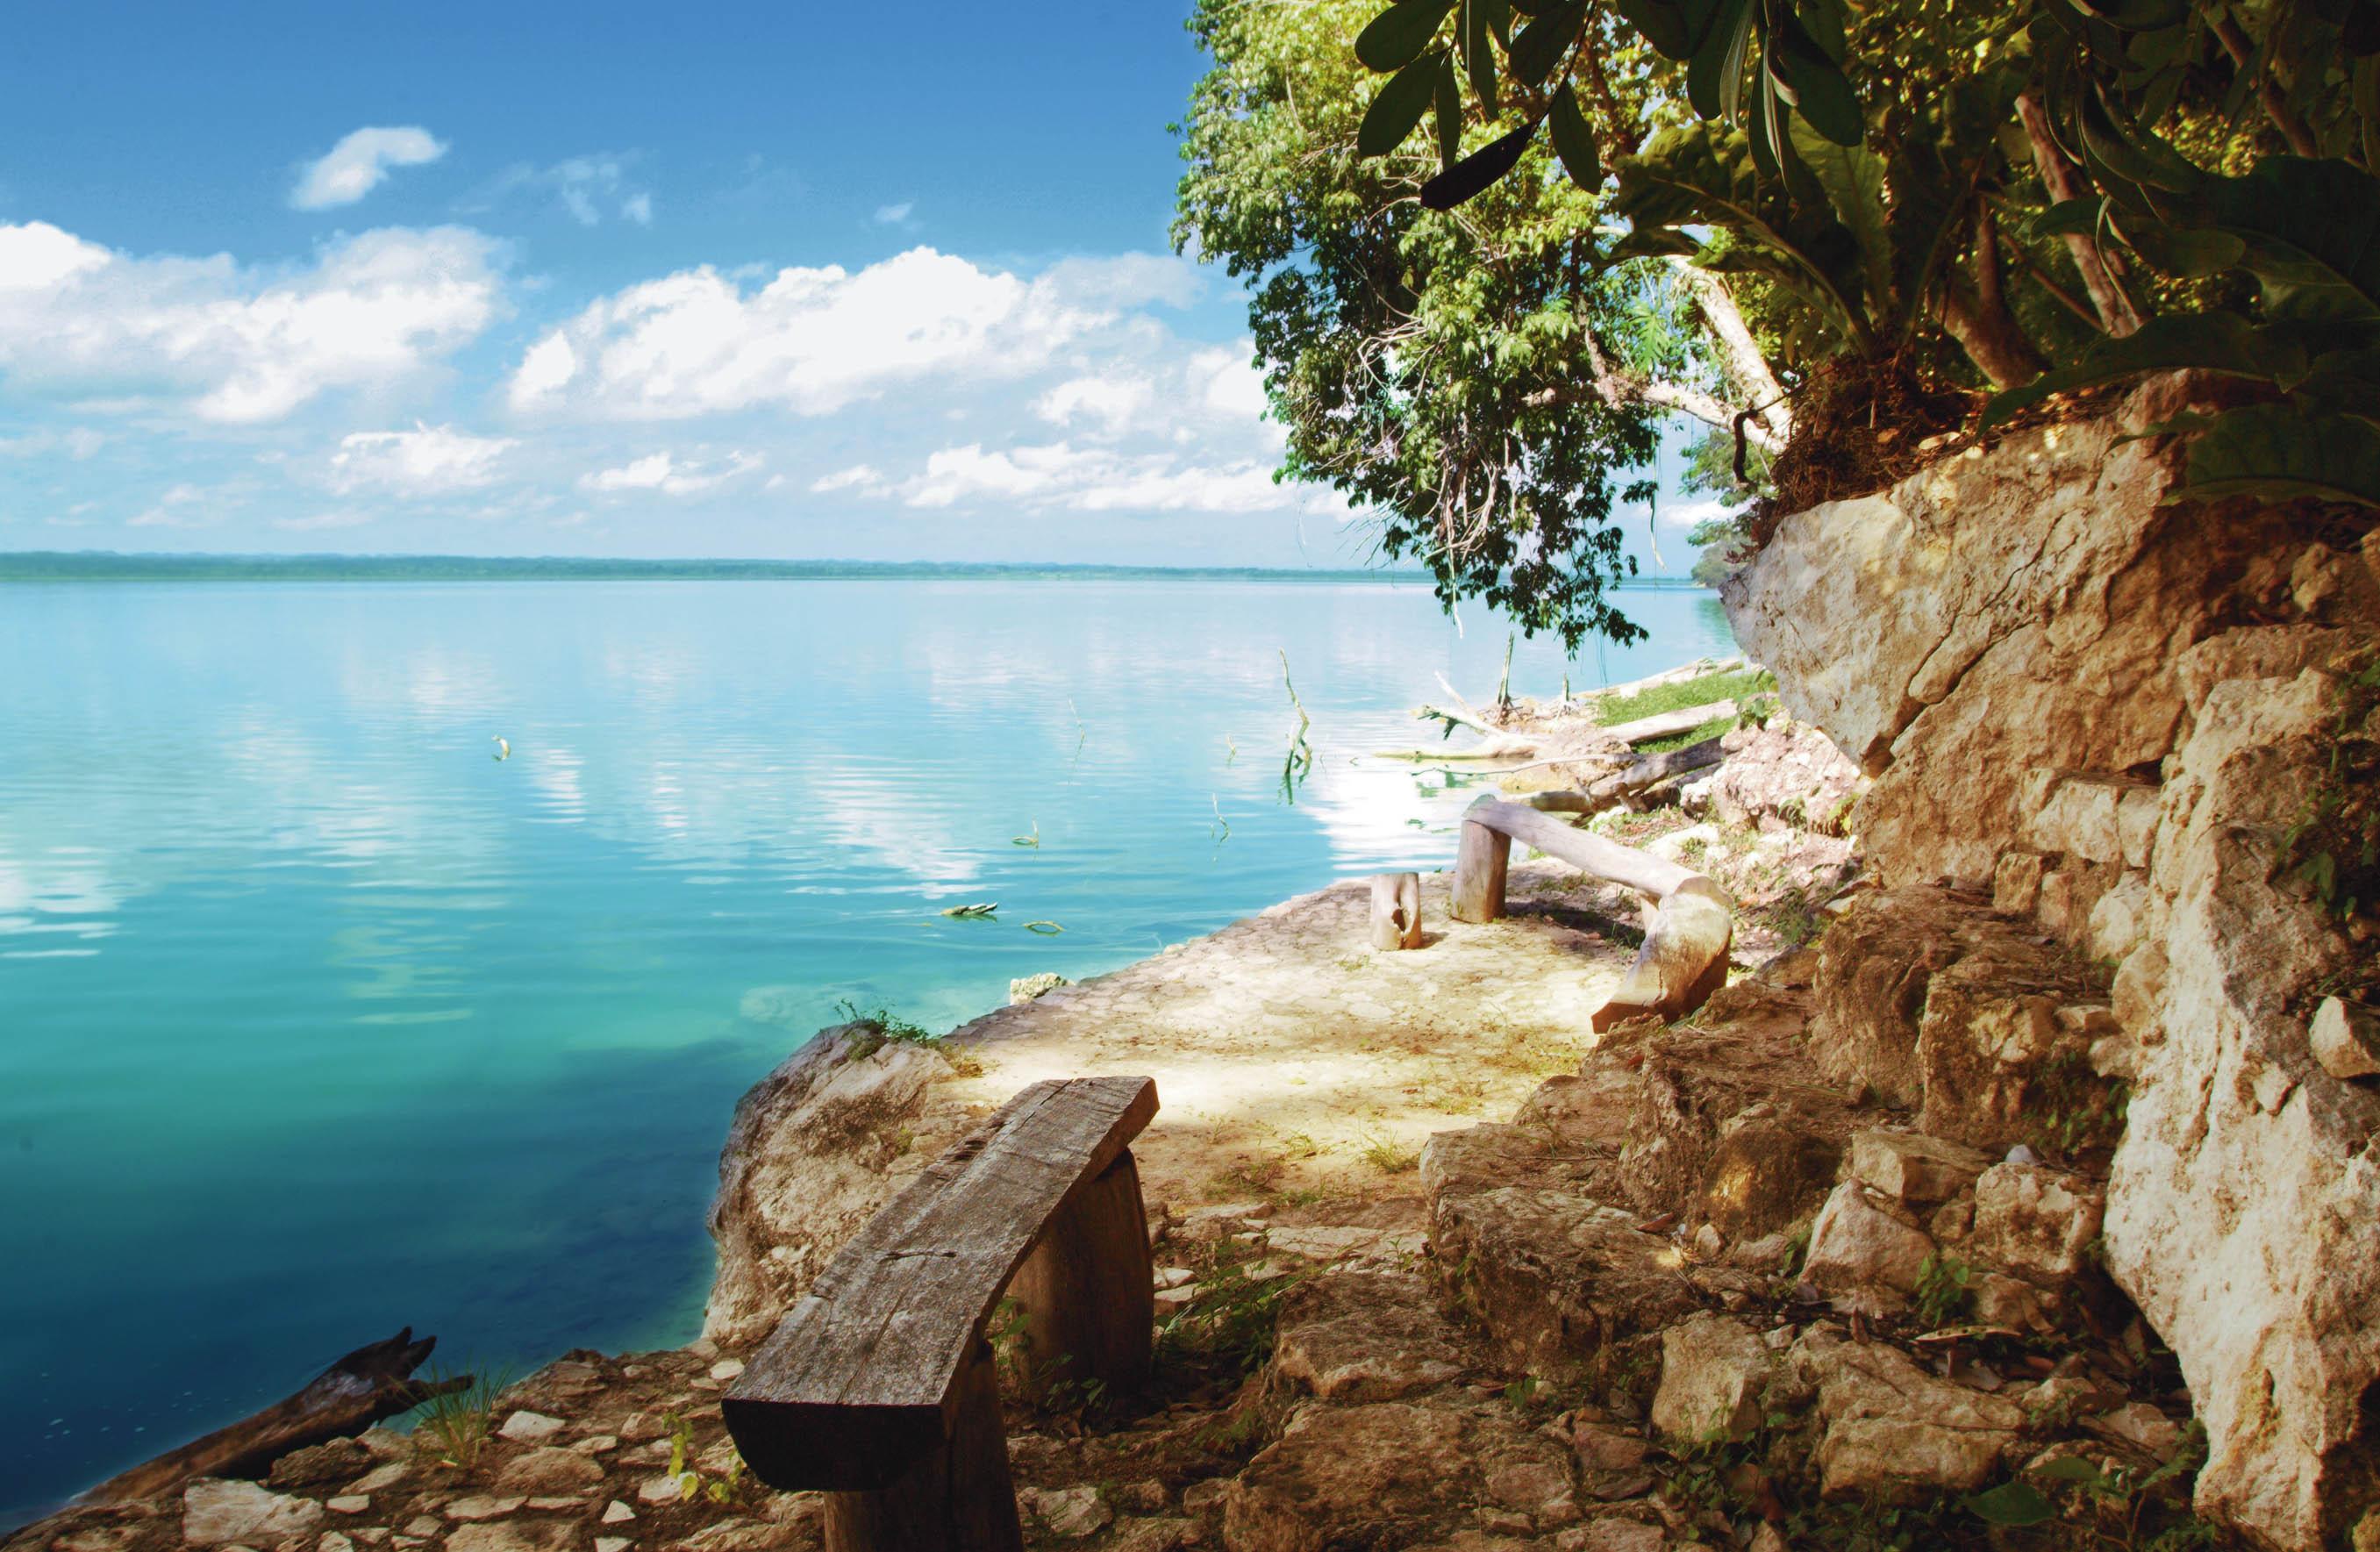 Lake Peten Itza